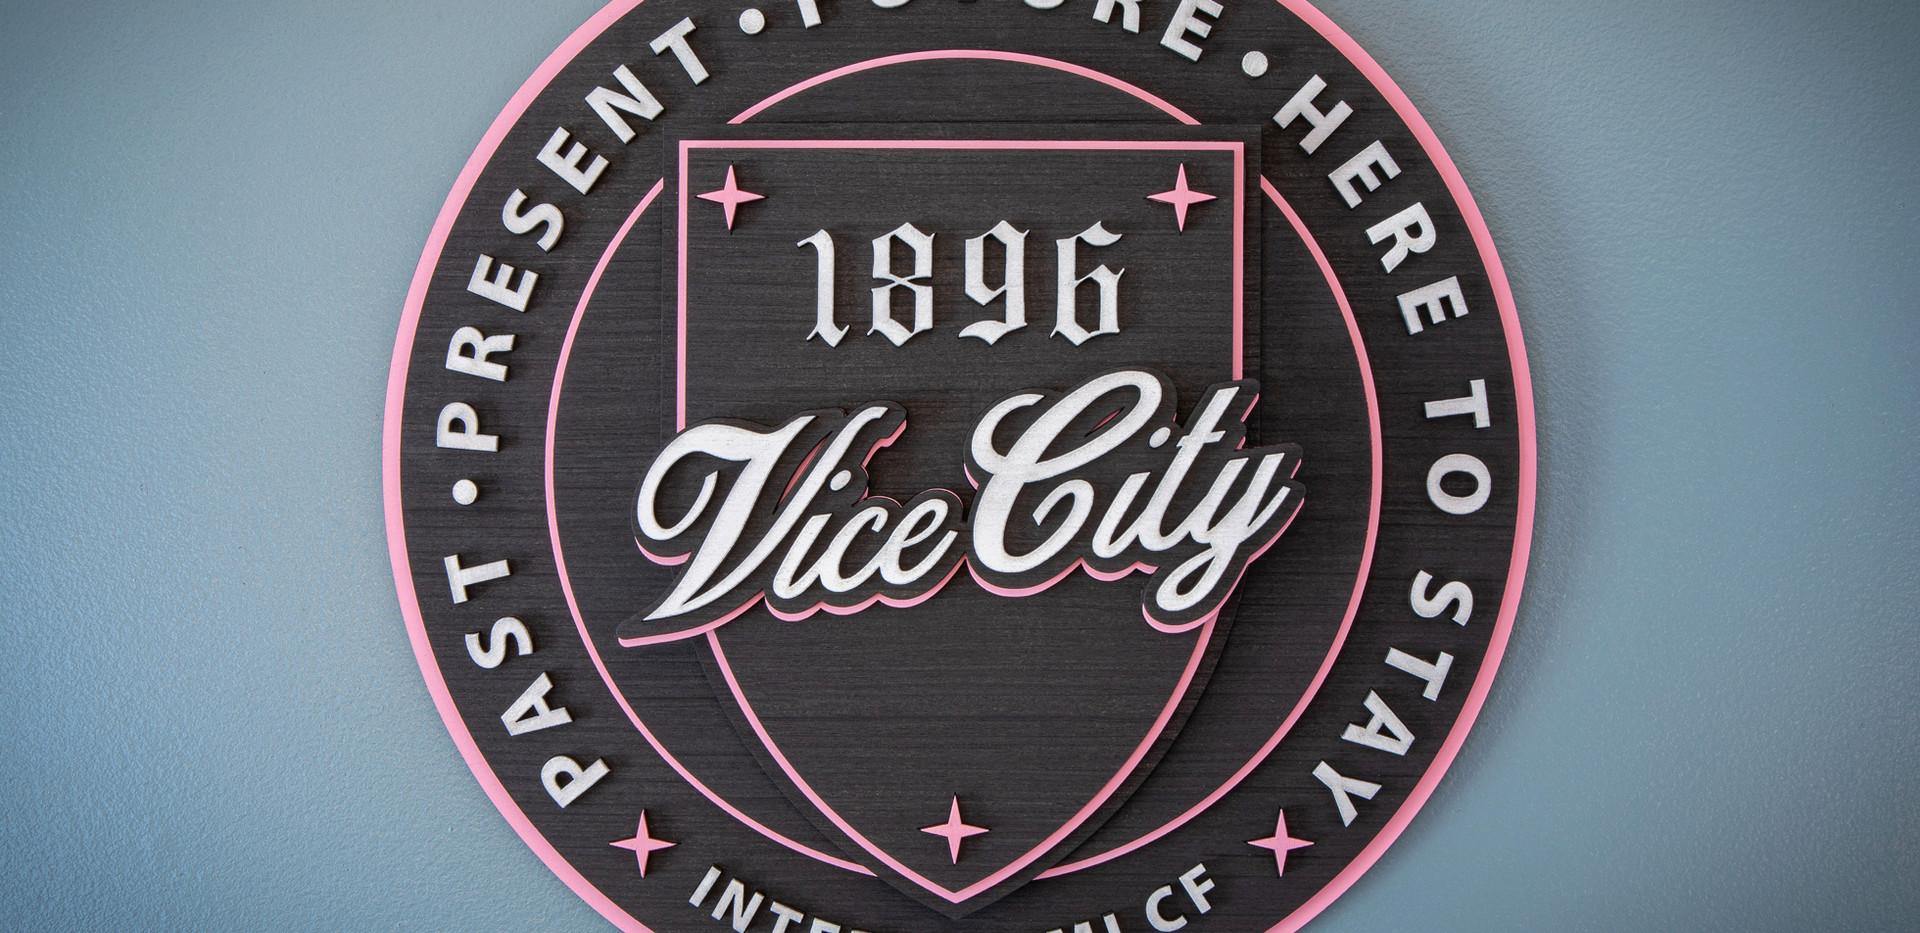 Miami Vice City.jpg